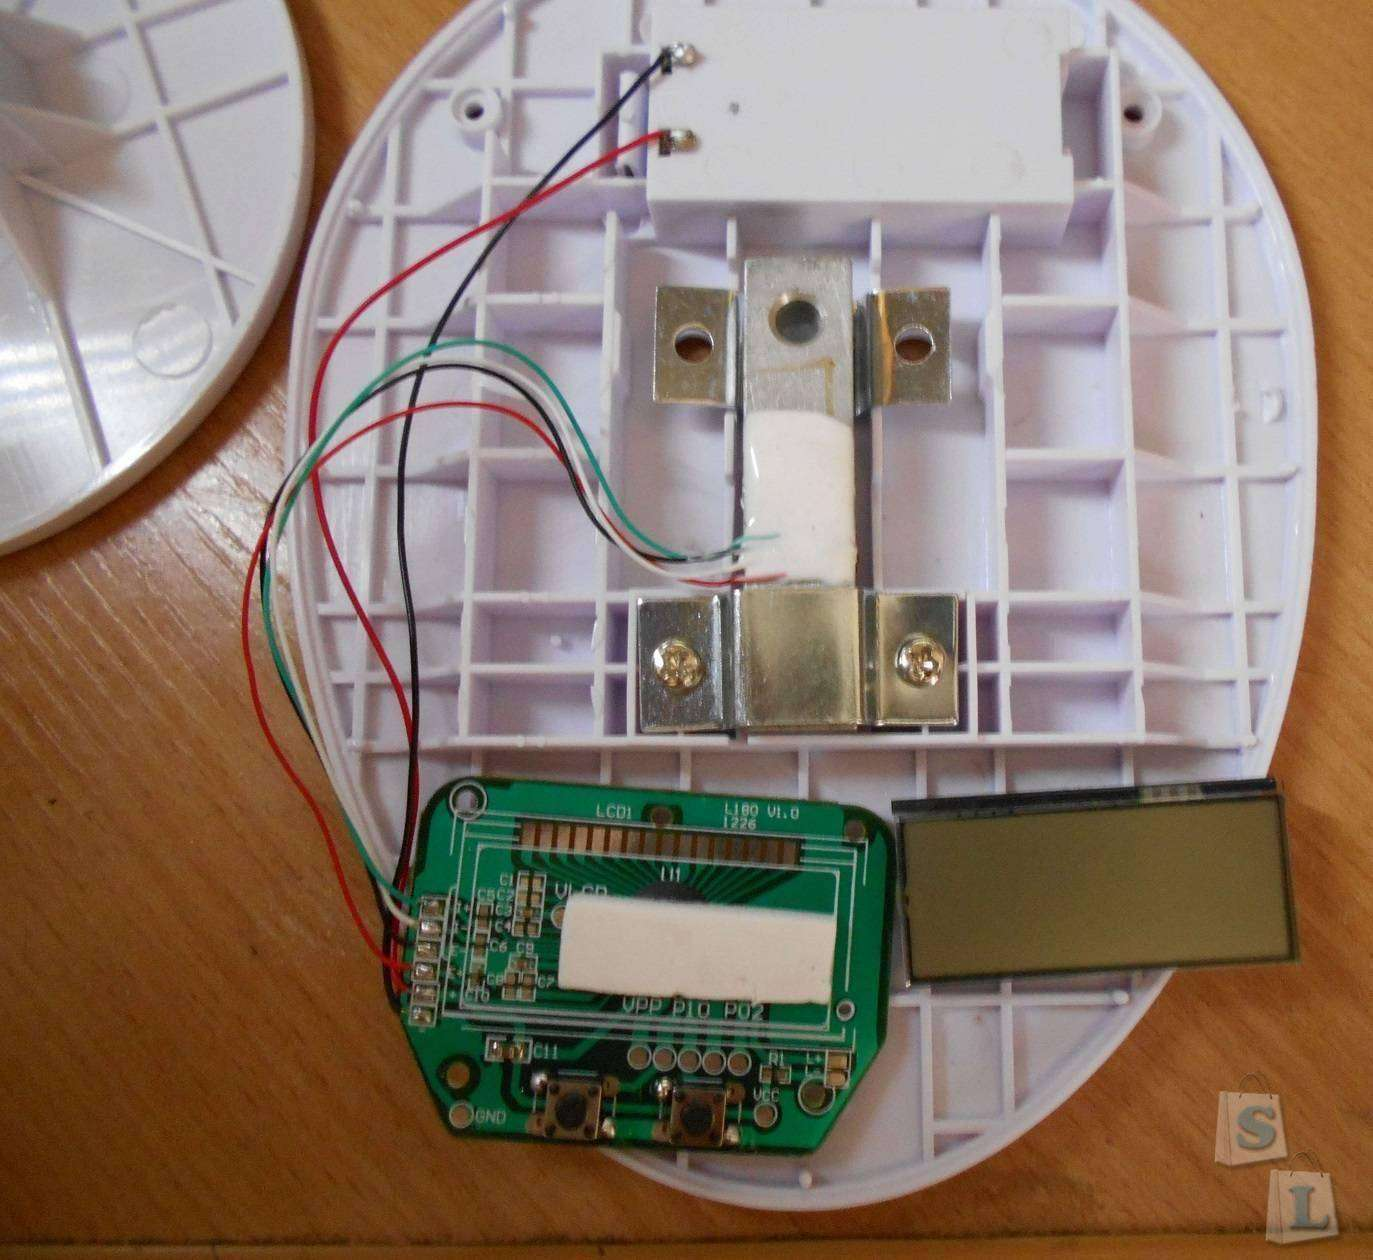 Aliexpress: Digital Kitchen Scale WH-B05 или кухонные электронные весы на 5кг с точностью 1г.